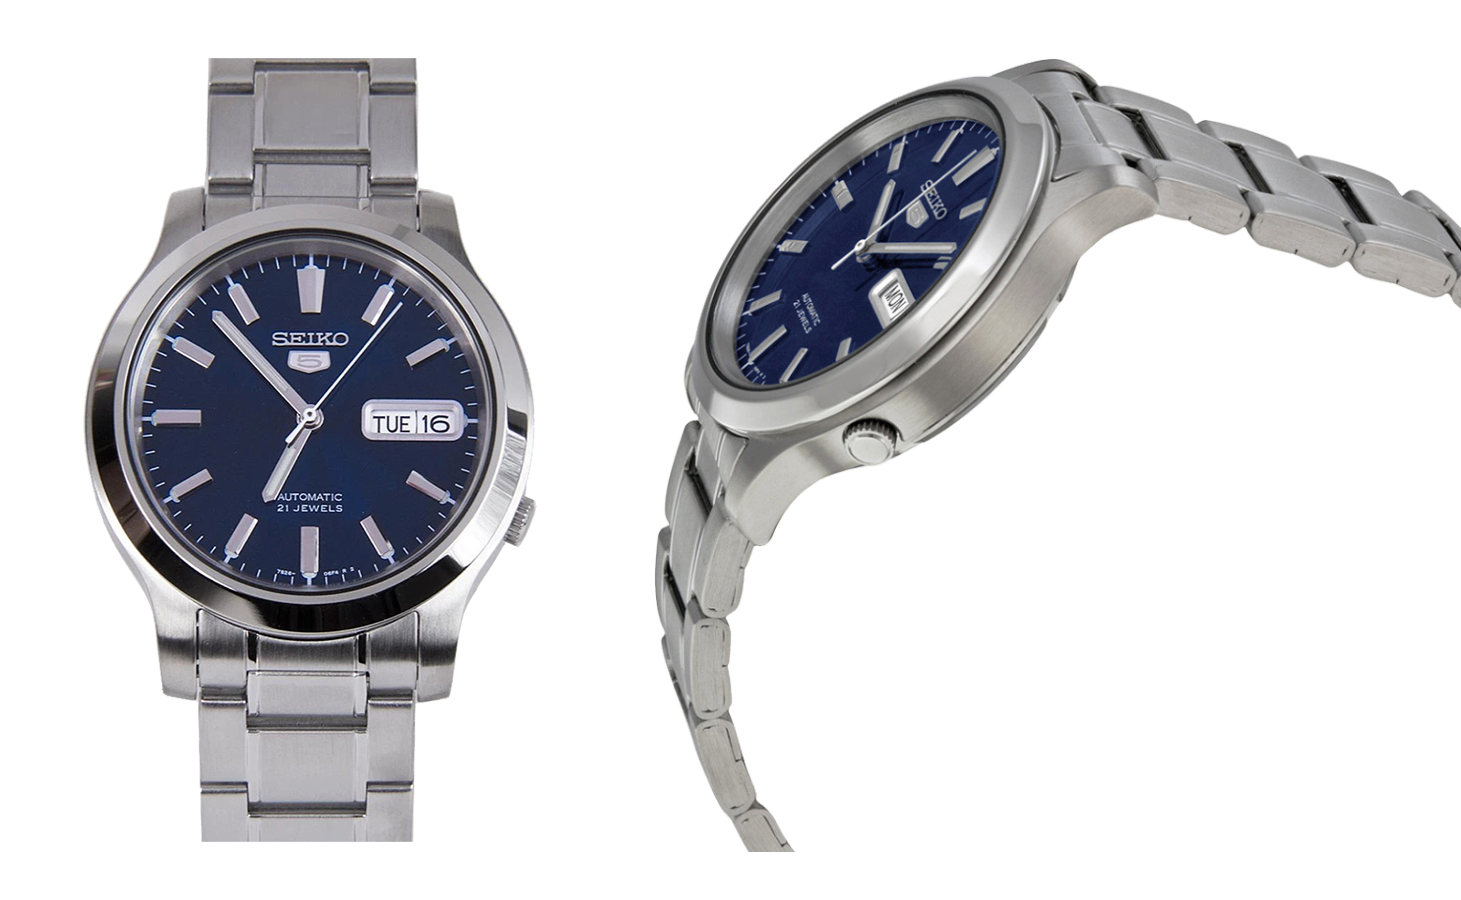 Seiko 5 SNK793 watch